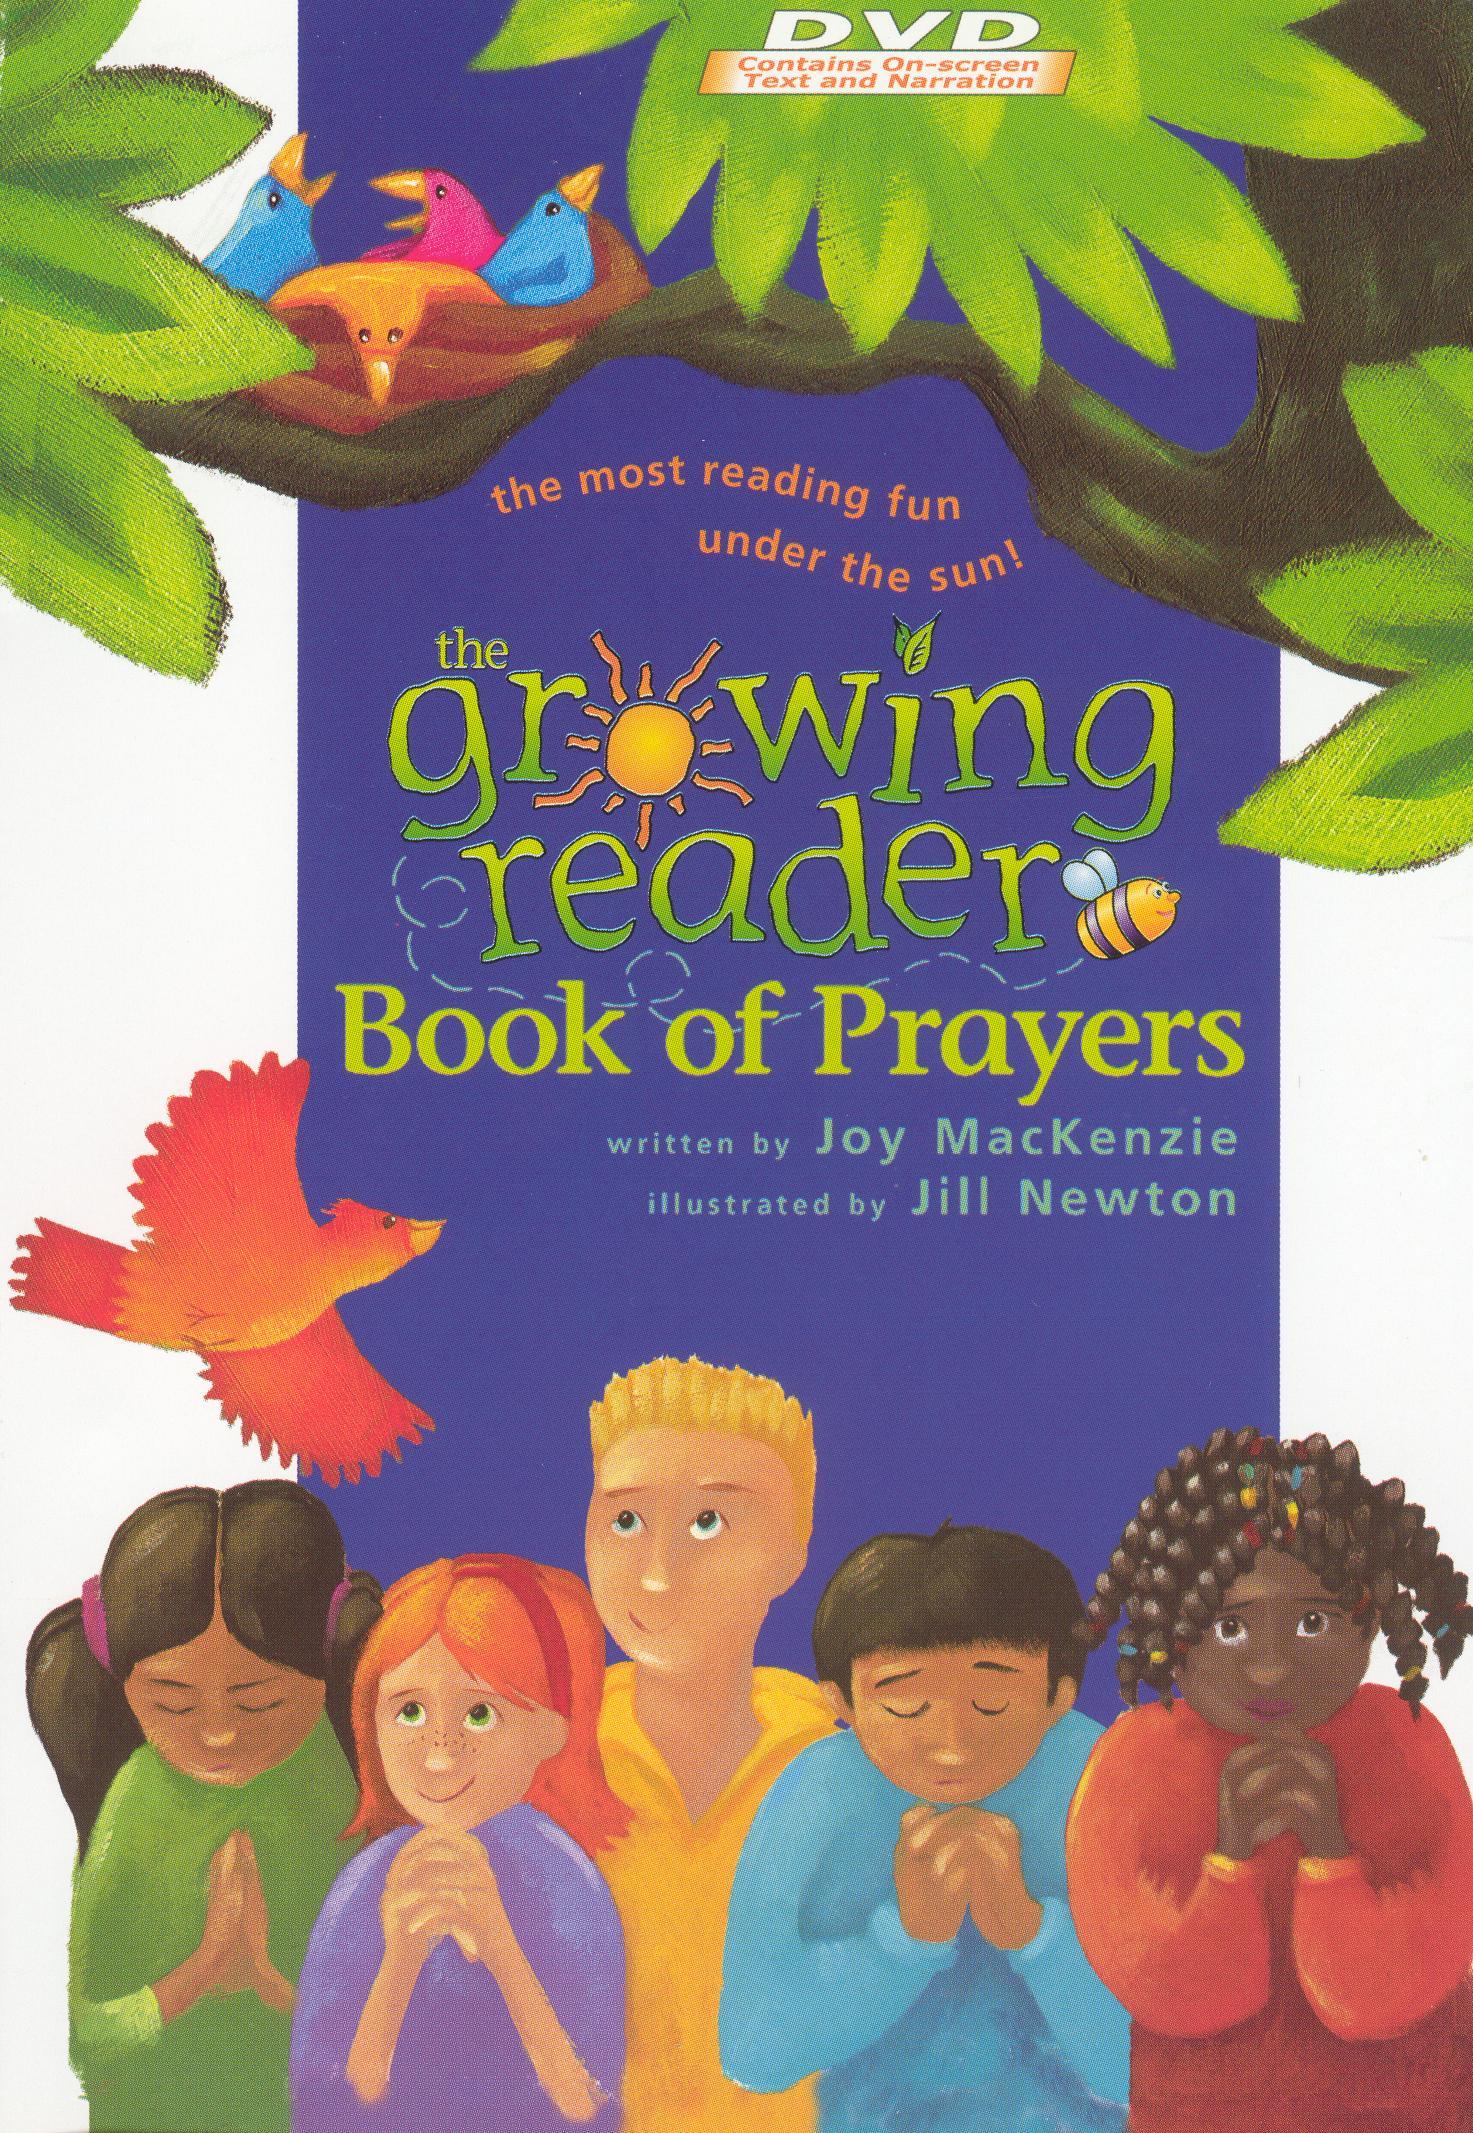 Growing Reader Phonics: The Book of Prayers